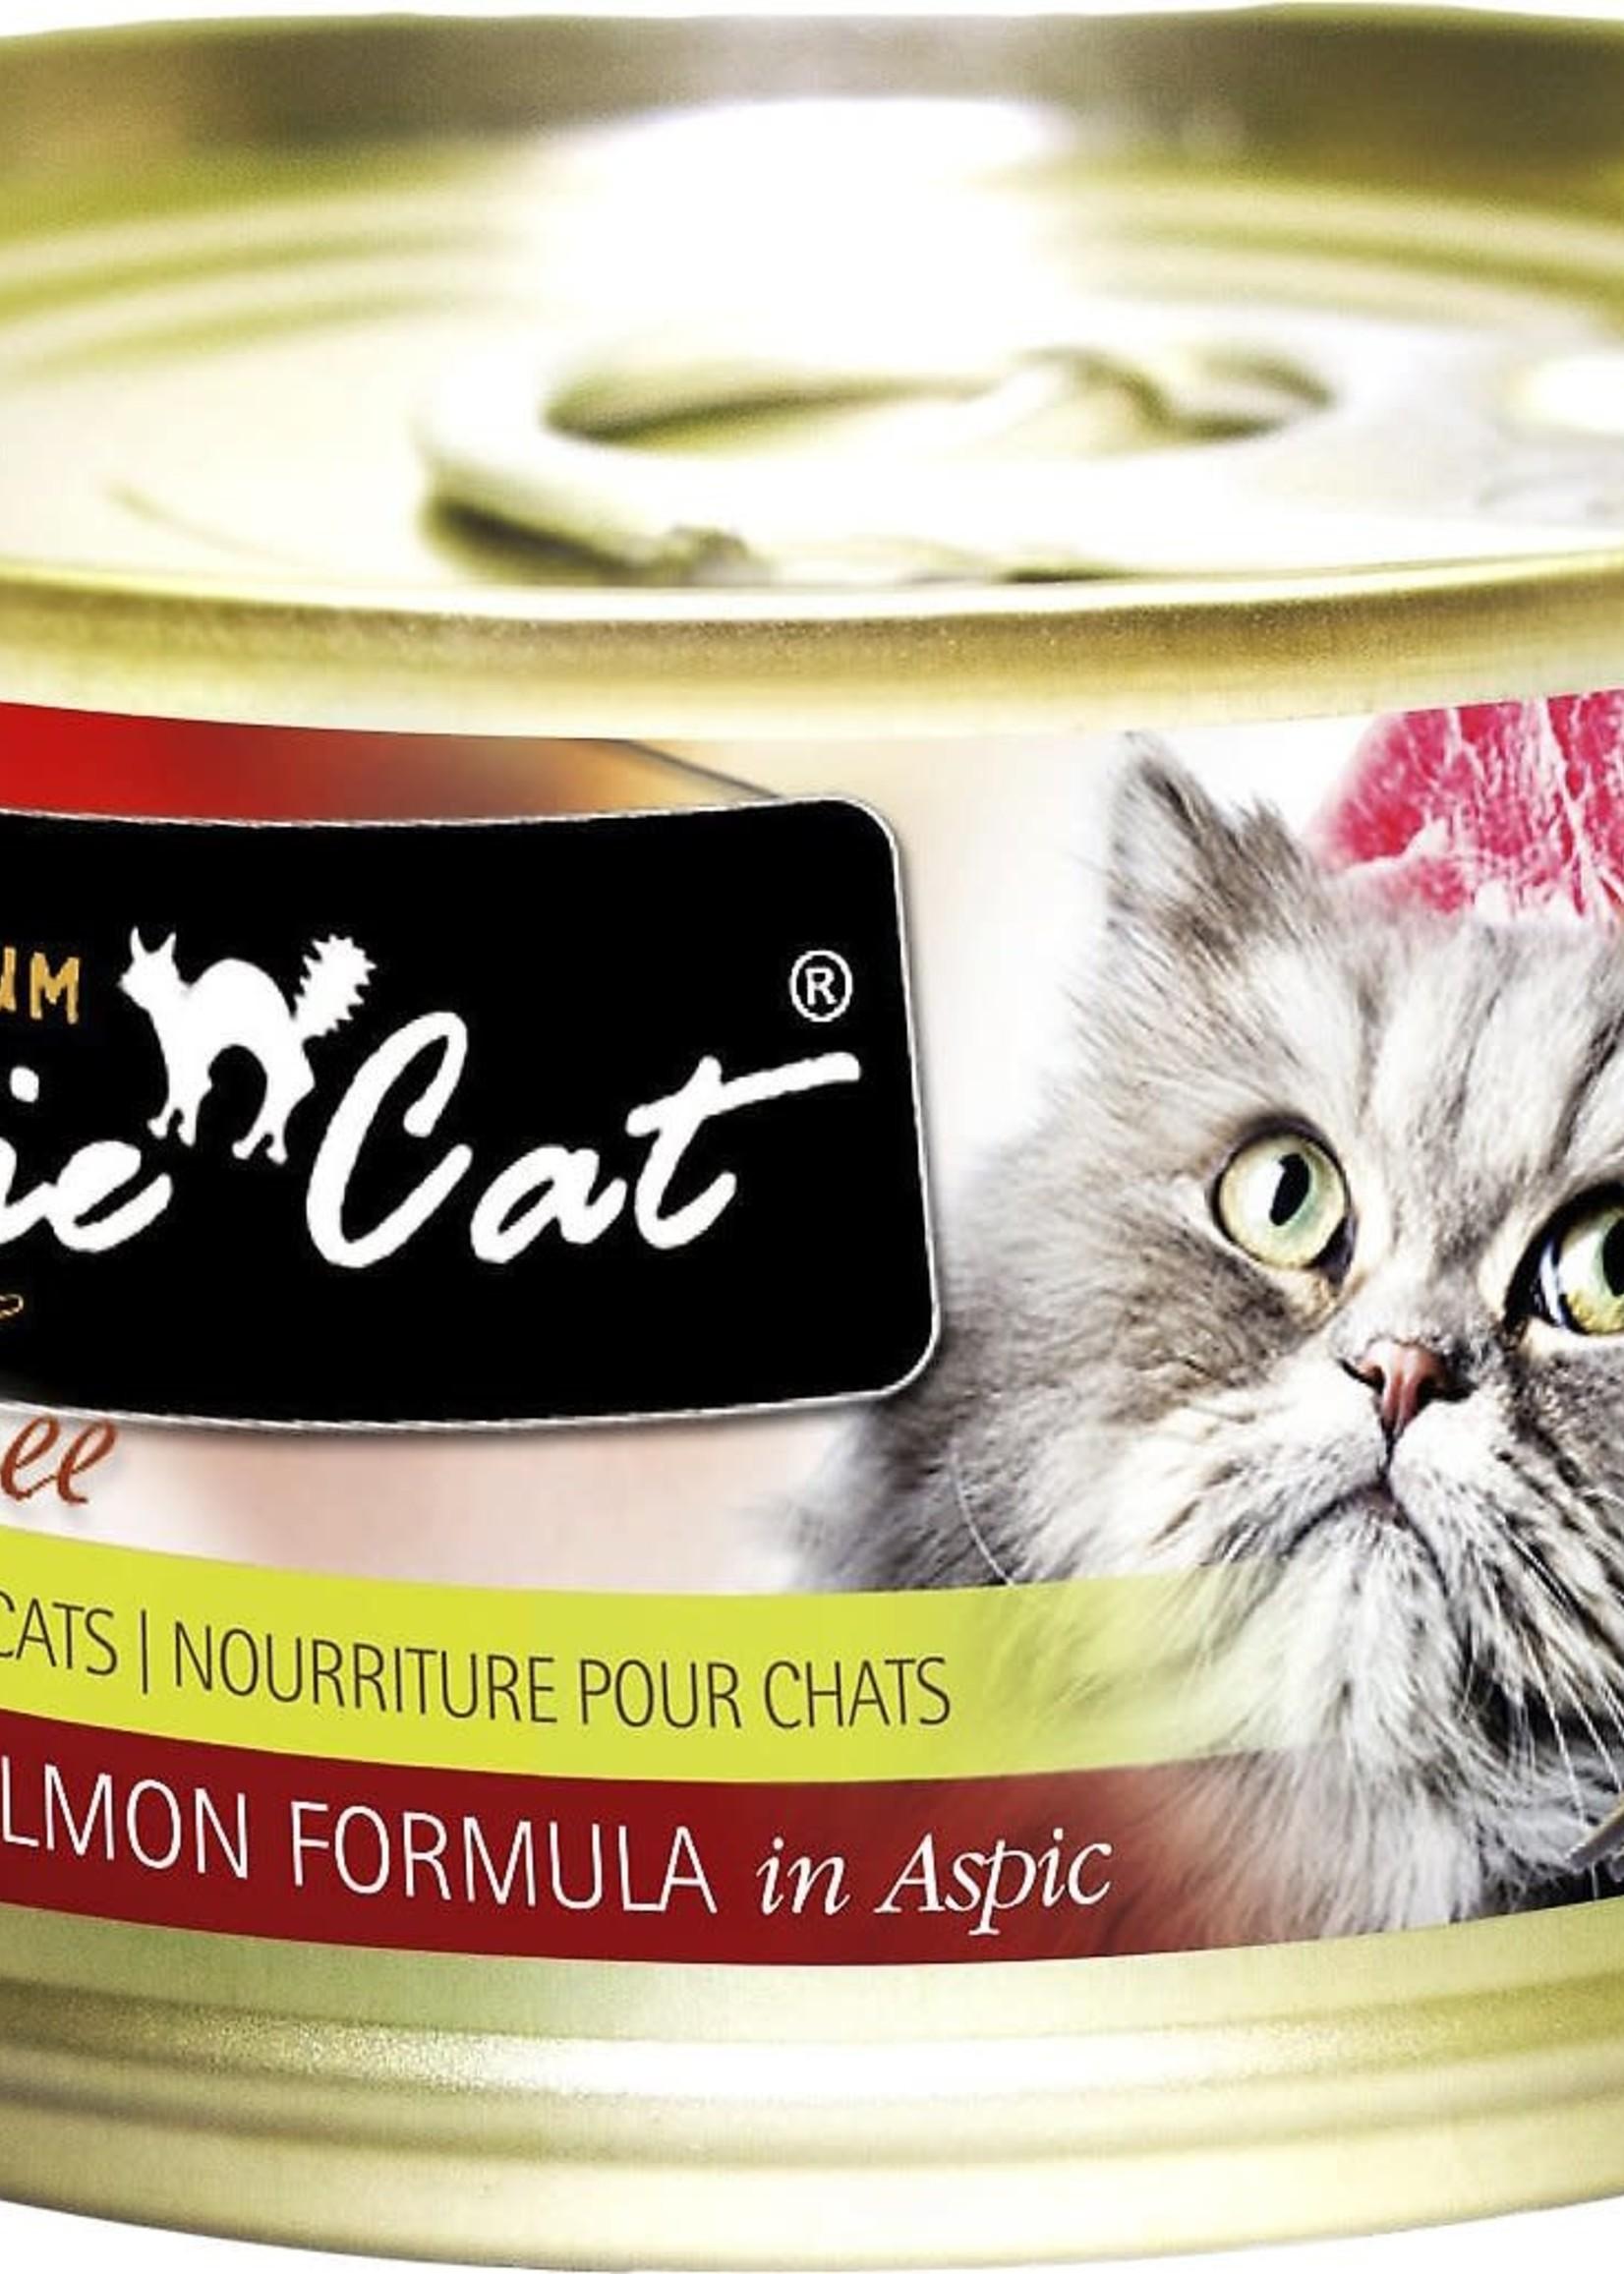 Fussie Cat Fussie Cat Can Premium Tuna with Salmon 2.8 oz